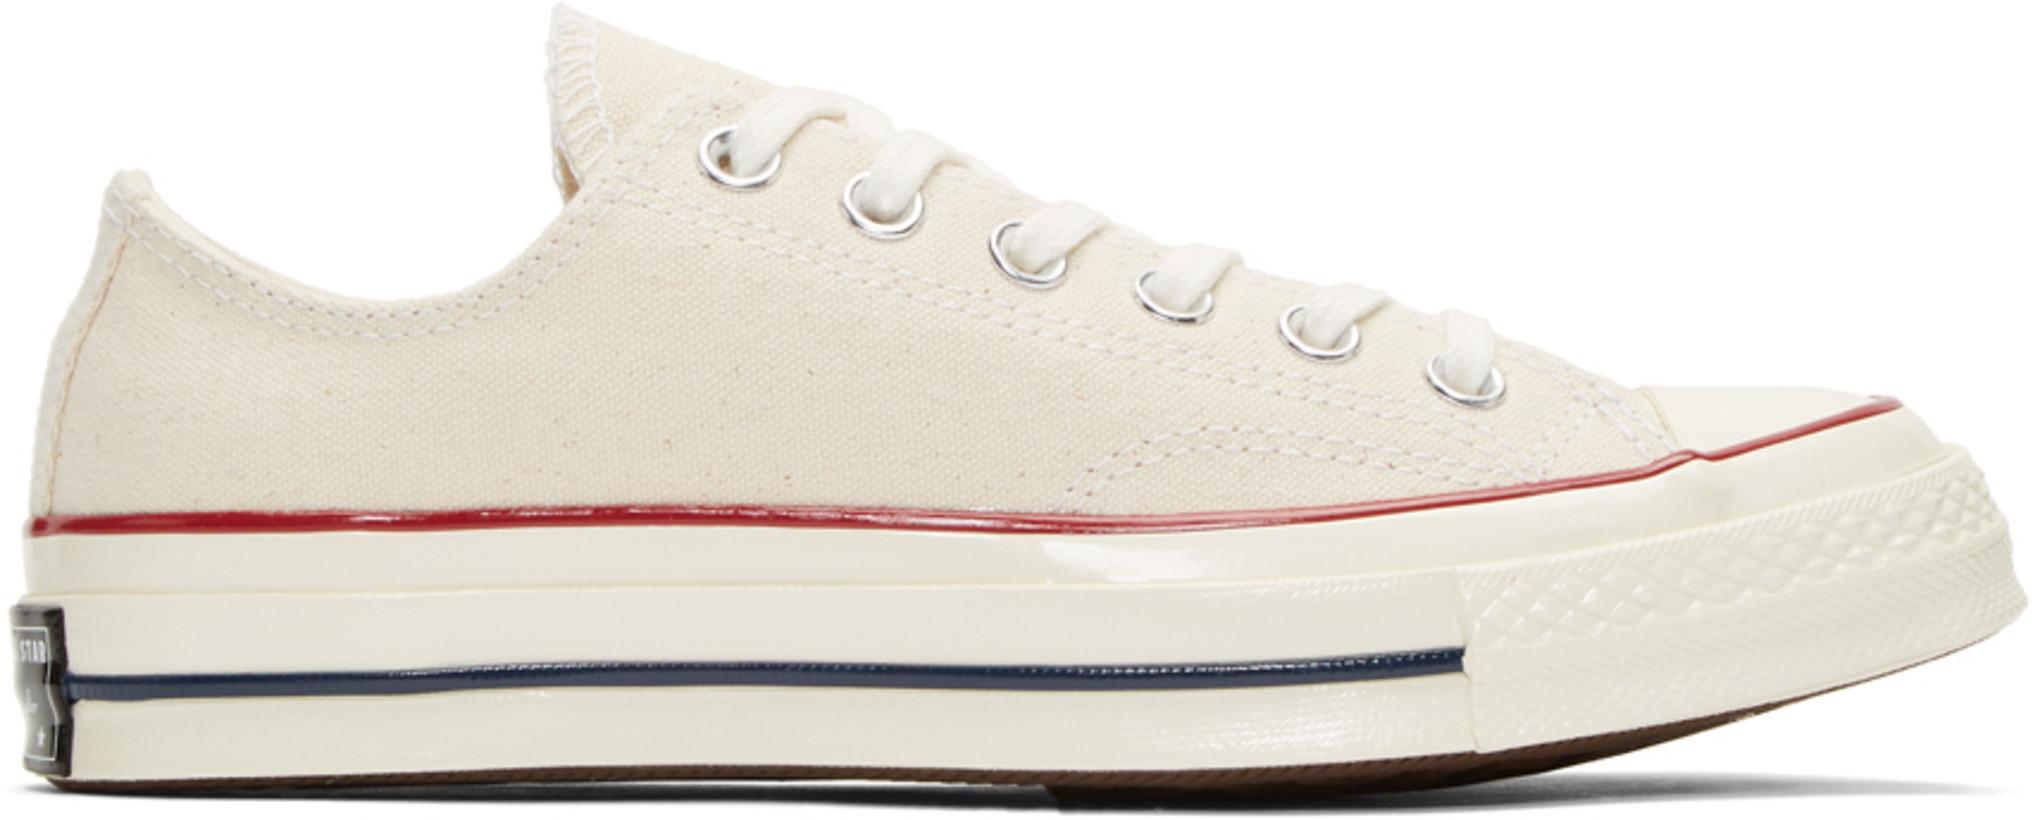 Converse オフホワイト Chuck 70 ロー スニーカー メンズ ¥8904 JPY